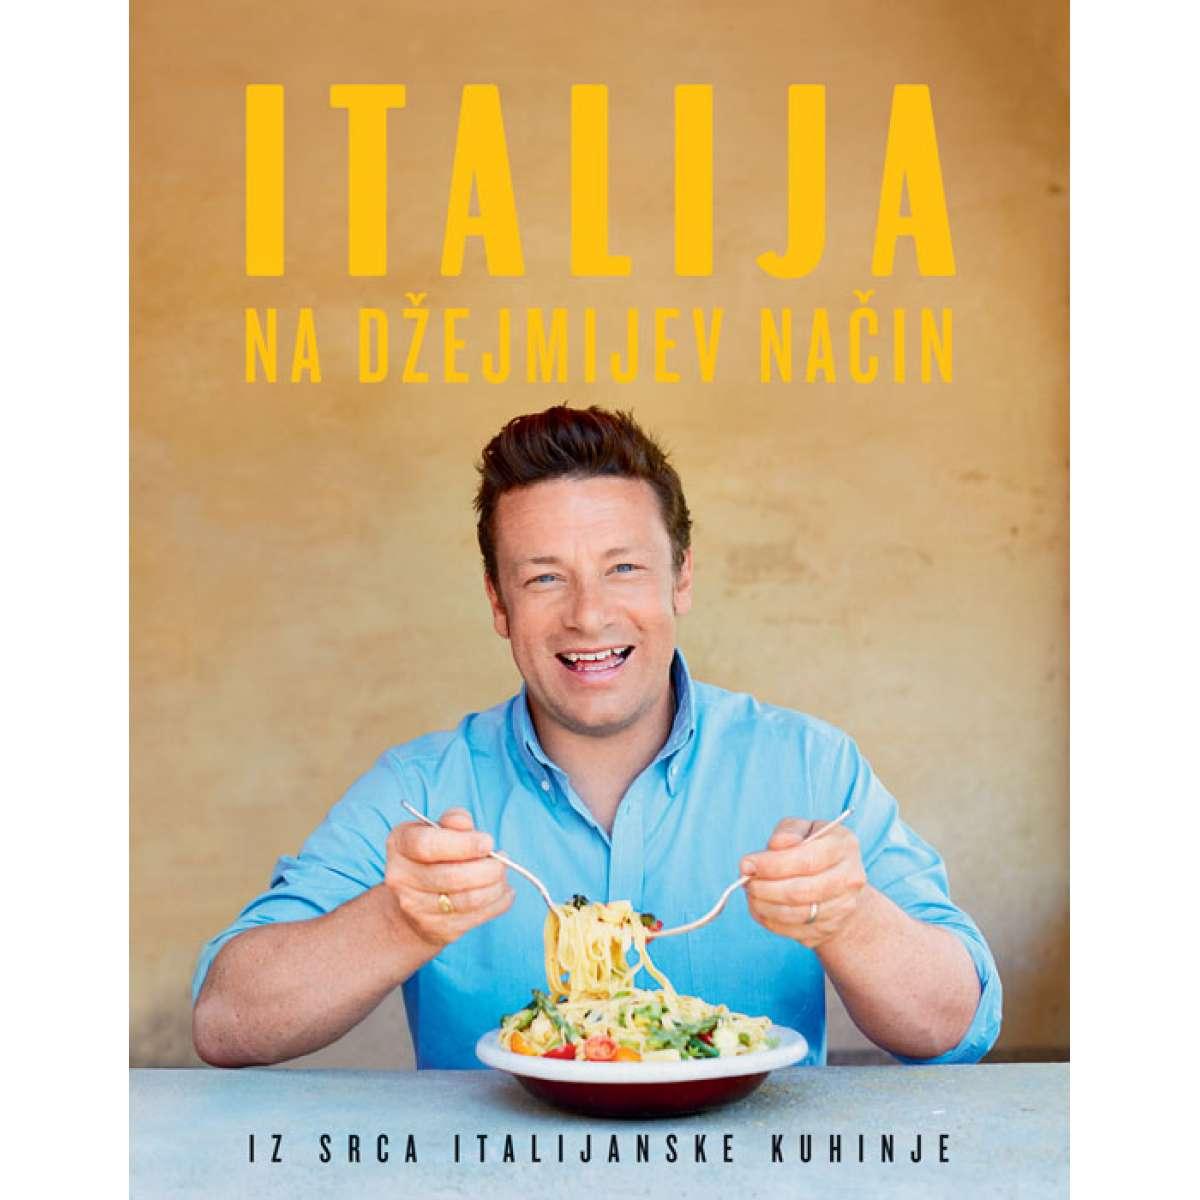 Italija na Džejmijev način